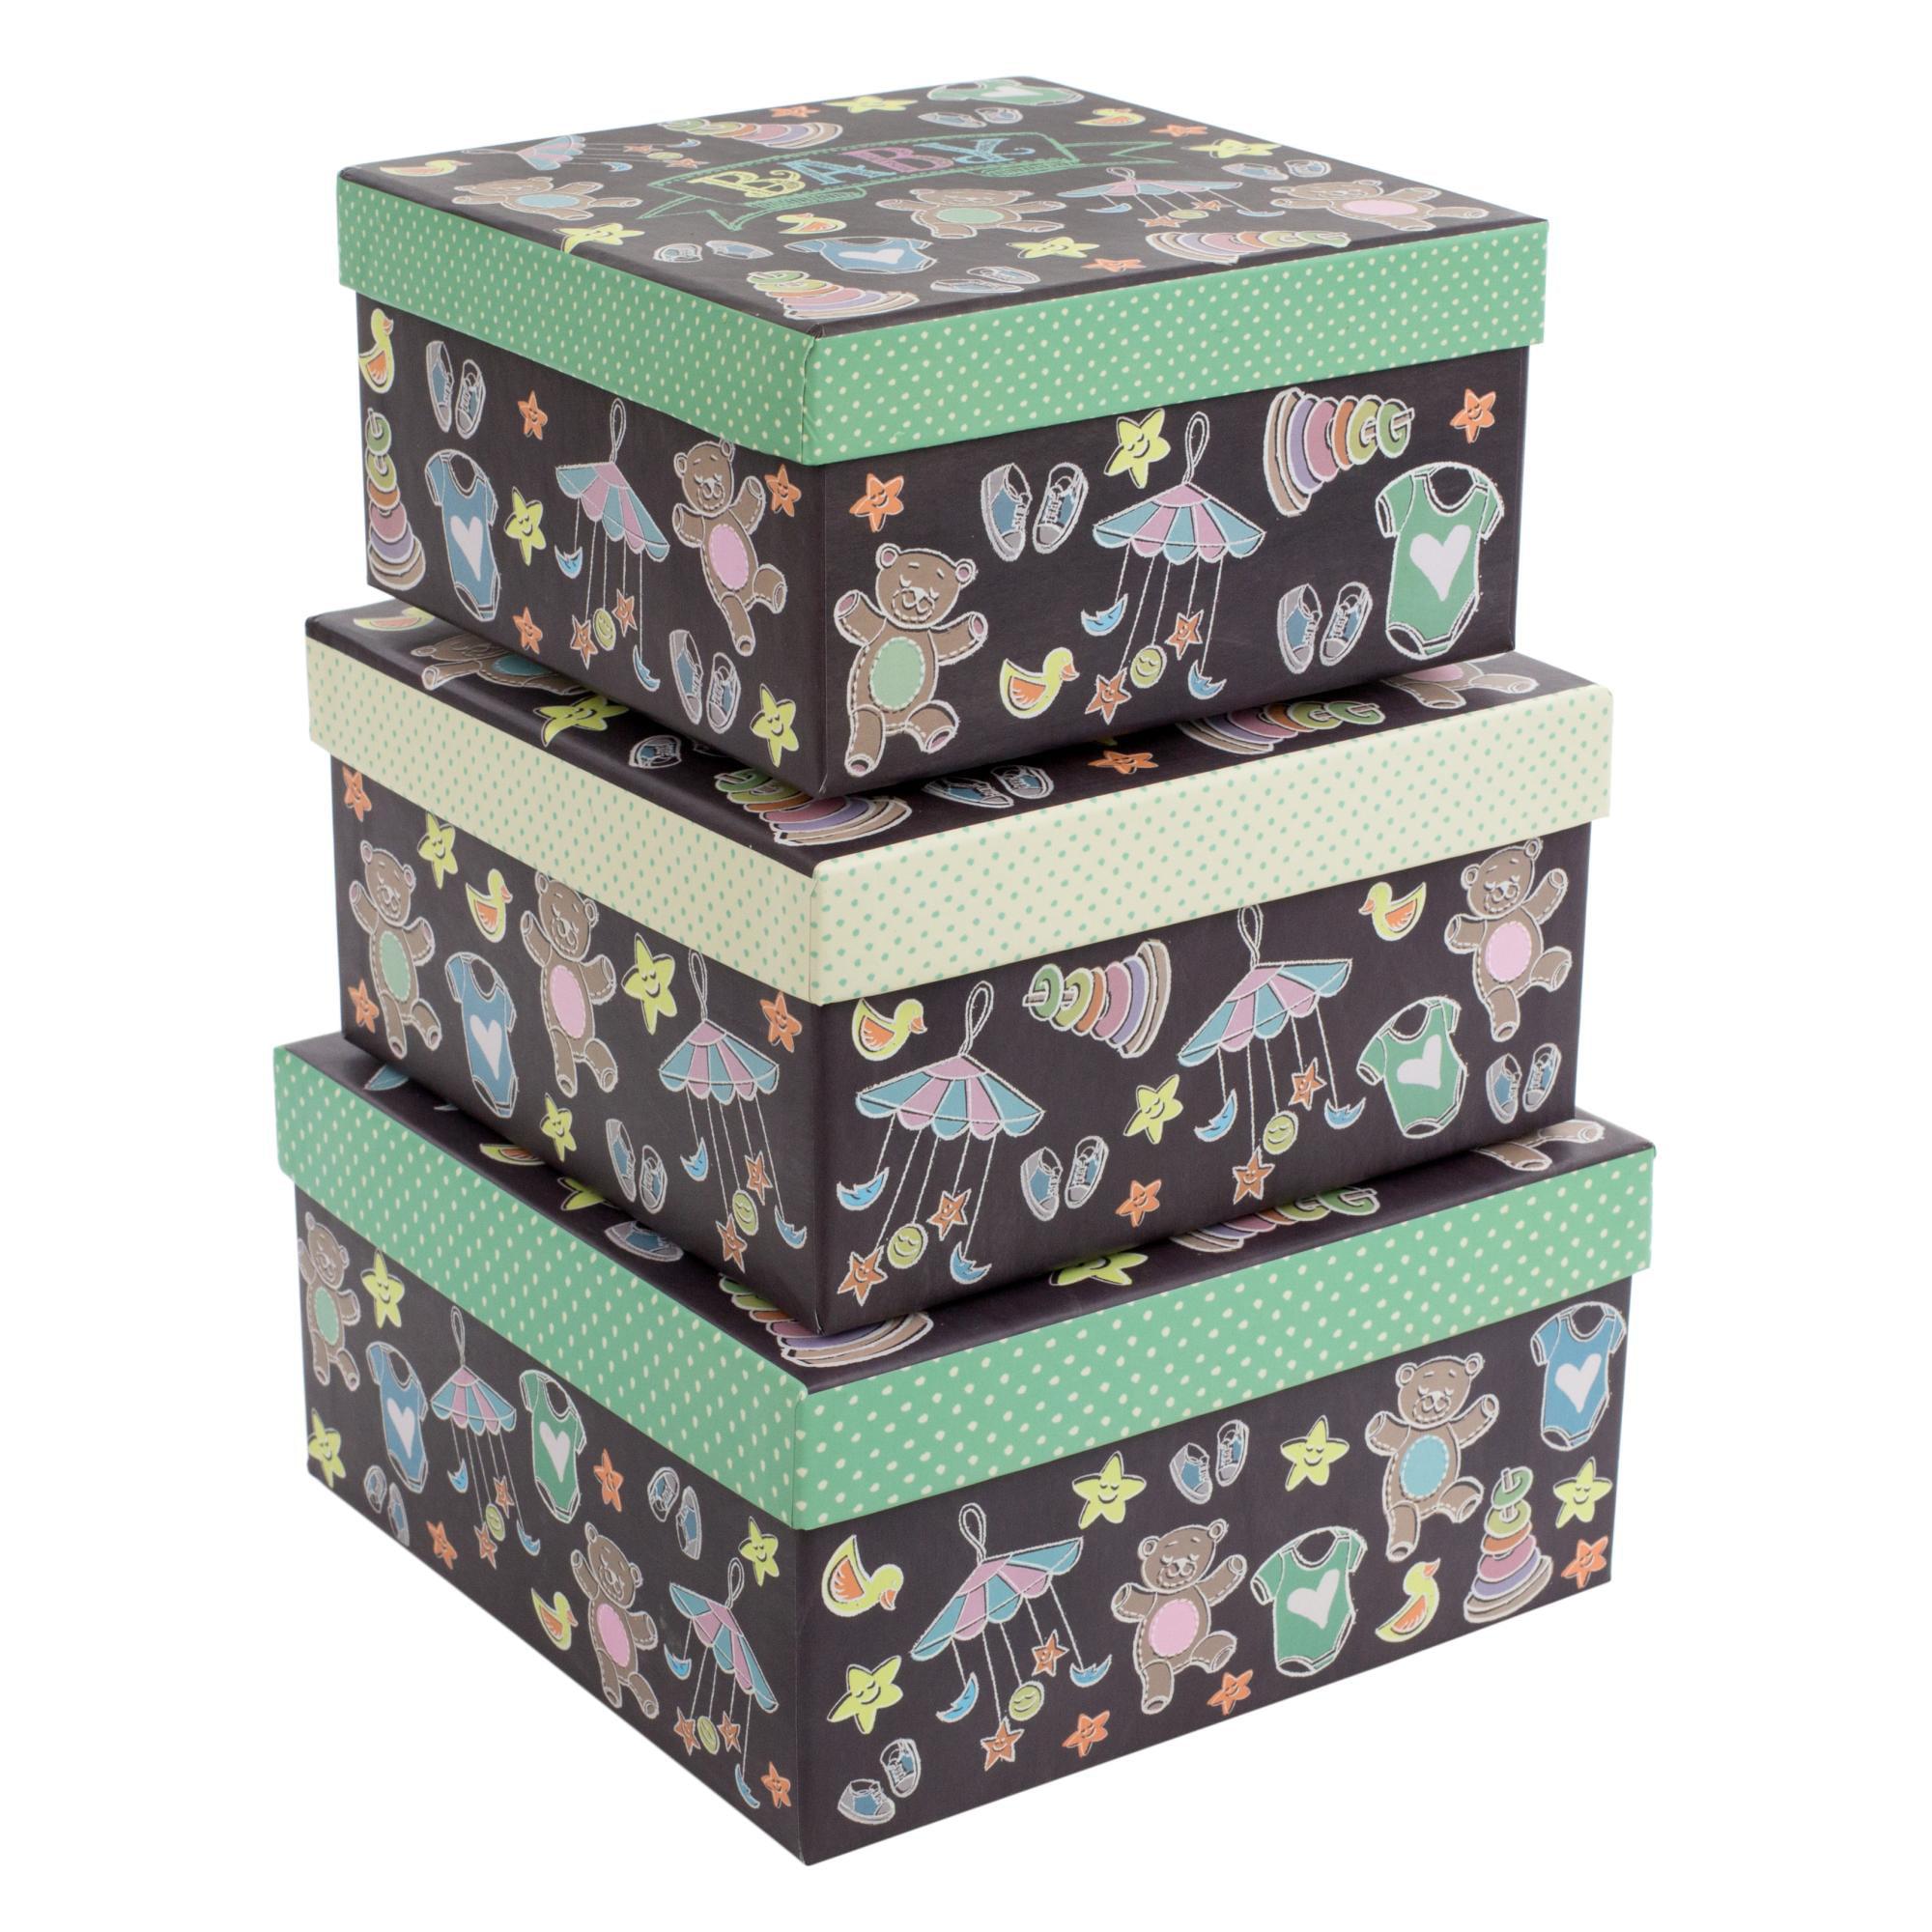 Tricoastal Design- Set Of 3 Decorative Storage Boxes Teddy Bears And Toys Print